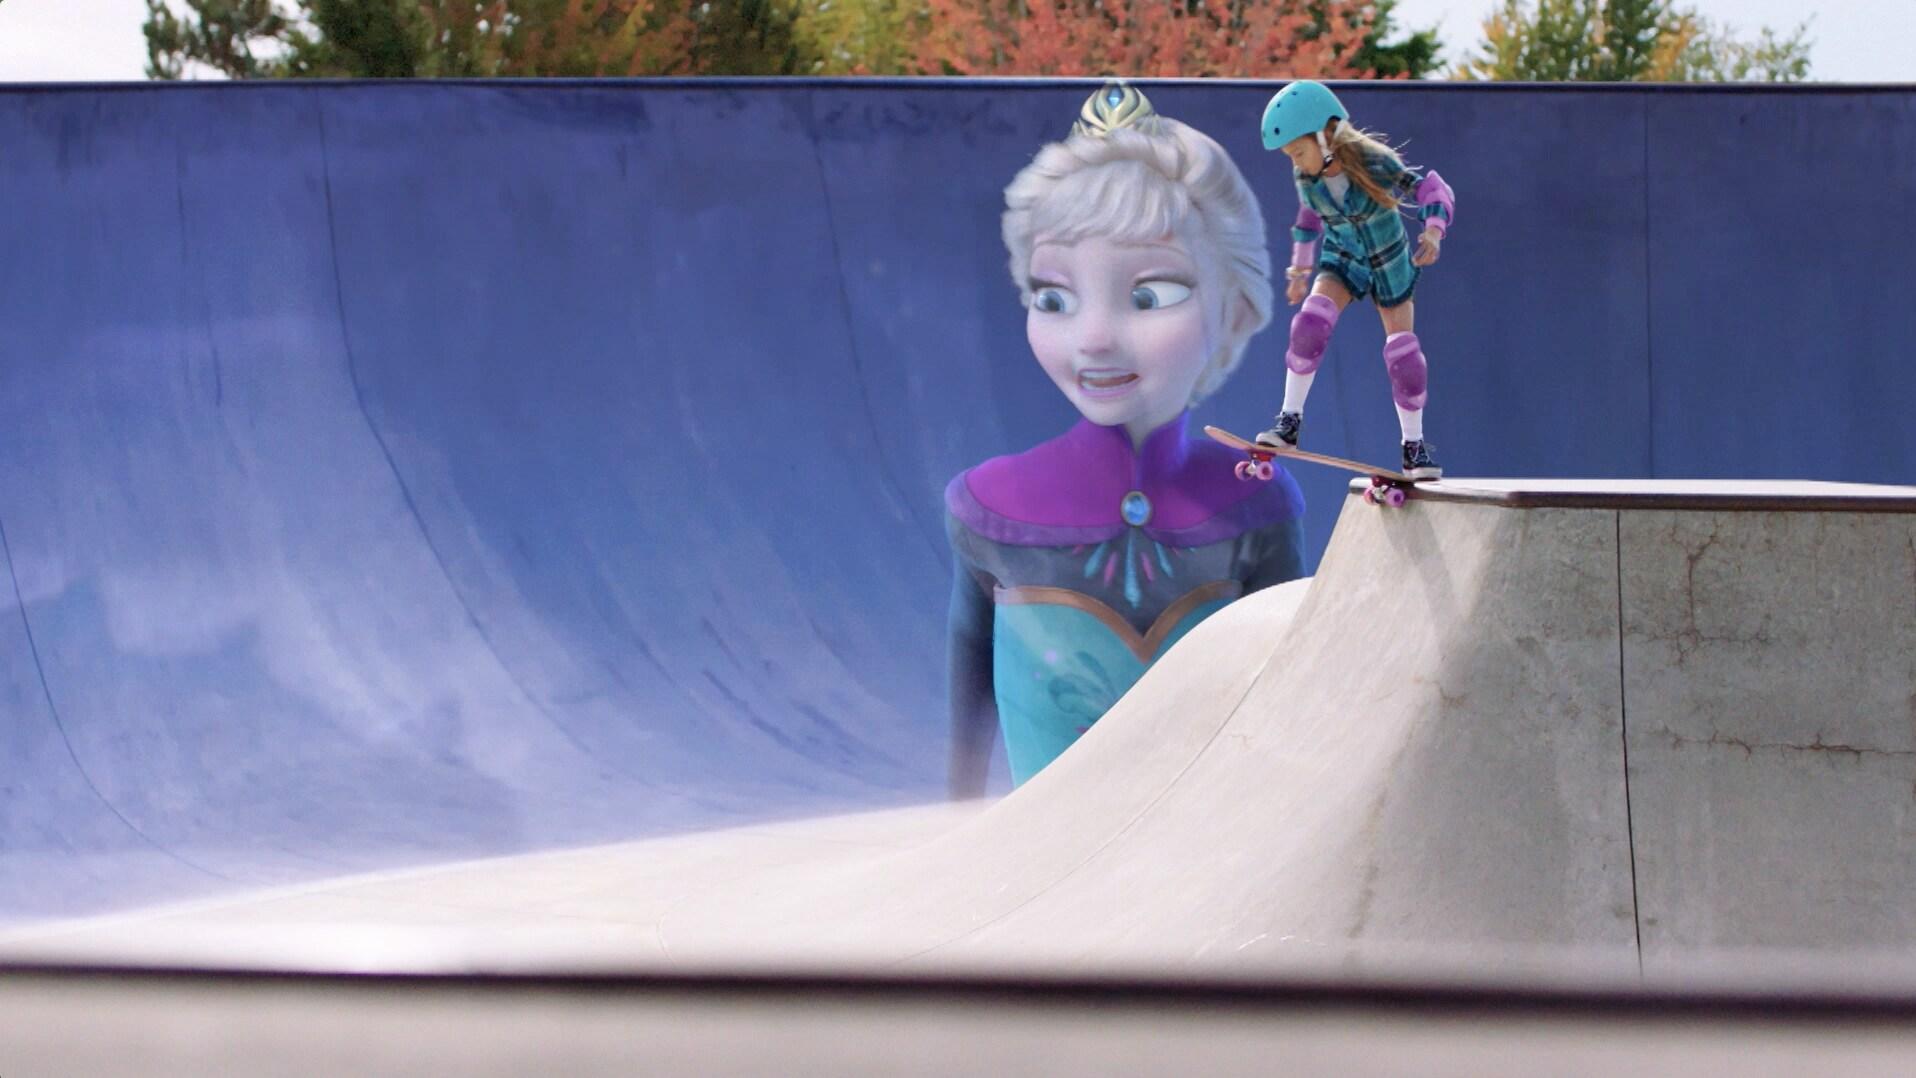 Projeções - Sou Princesa, Sou Real